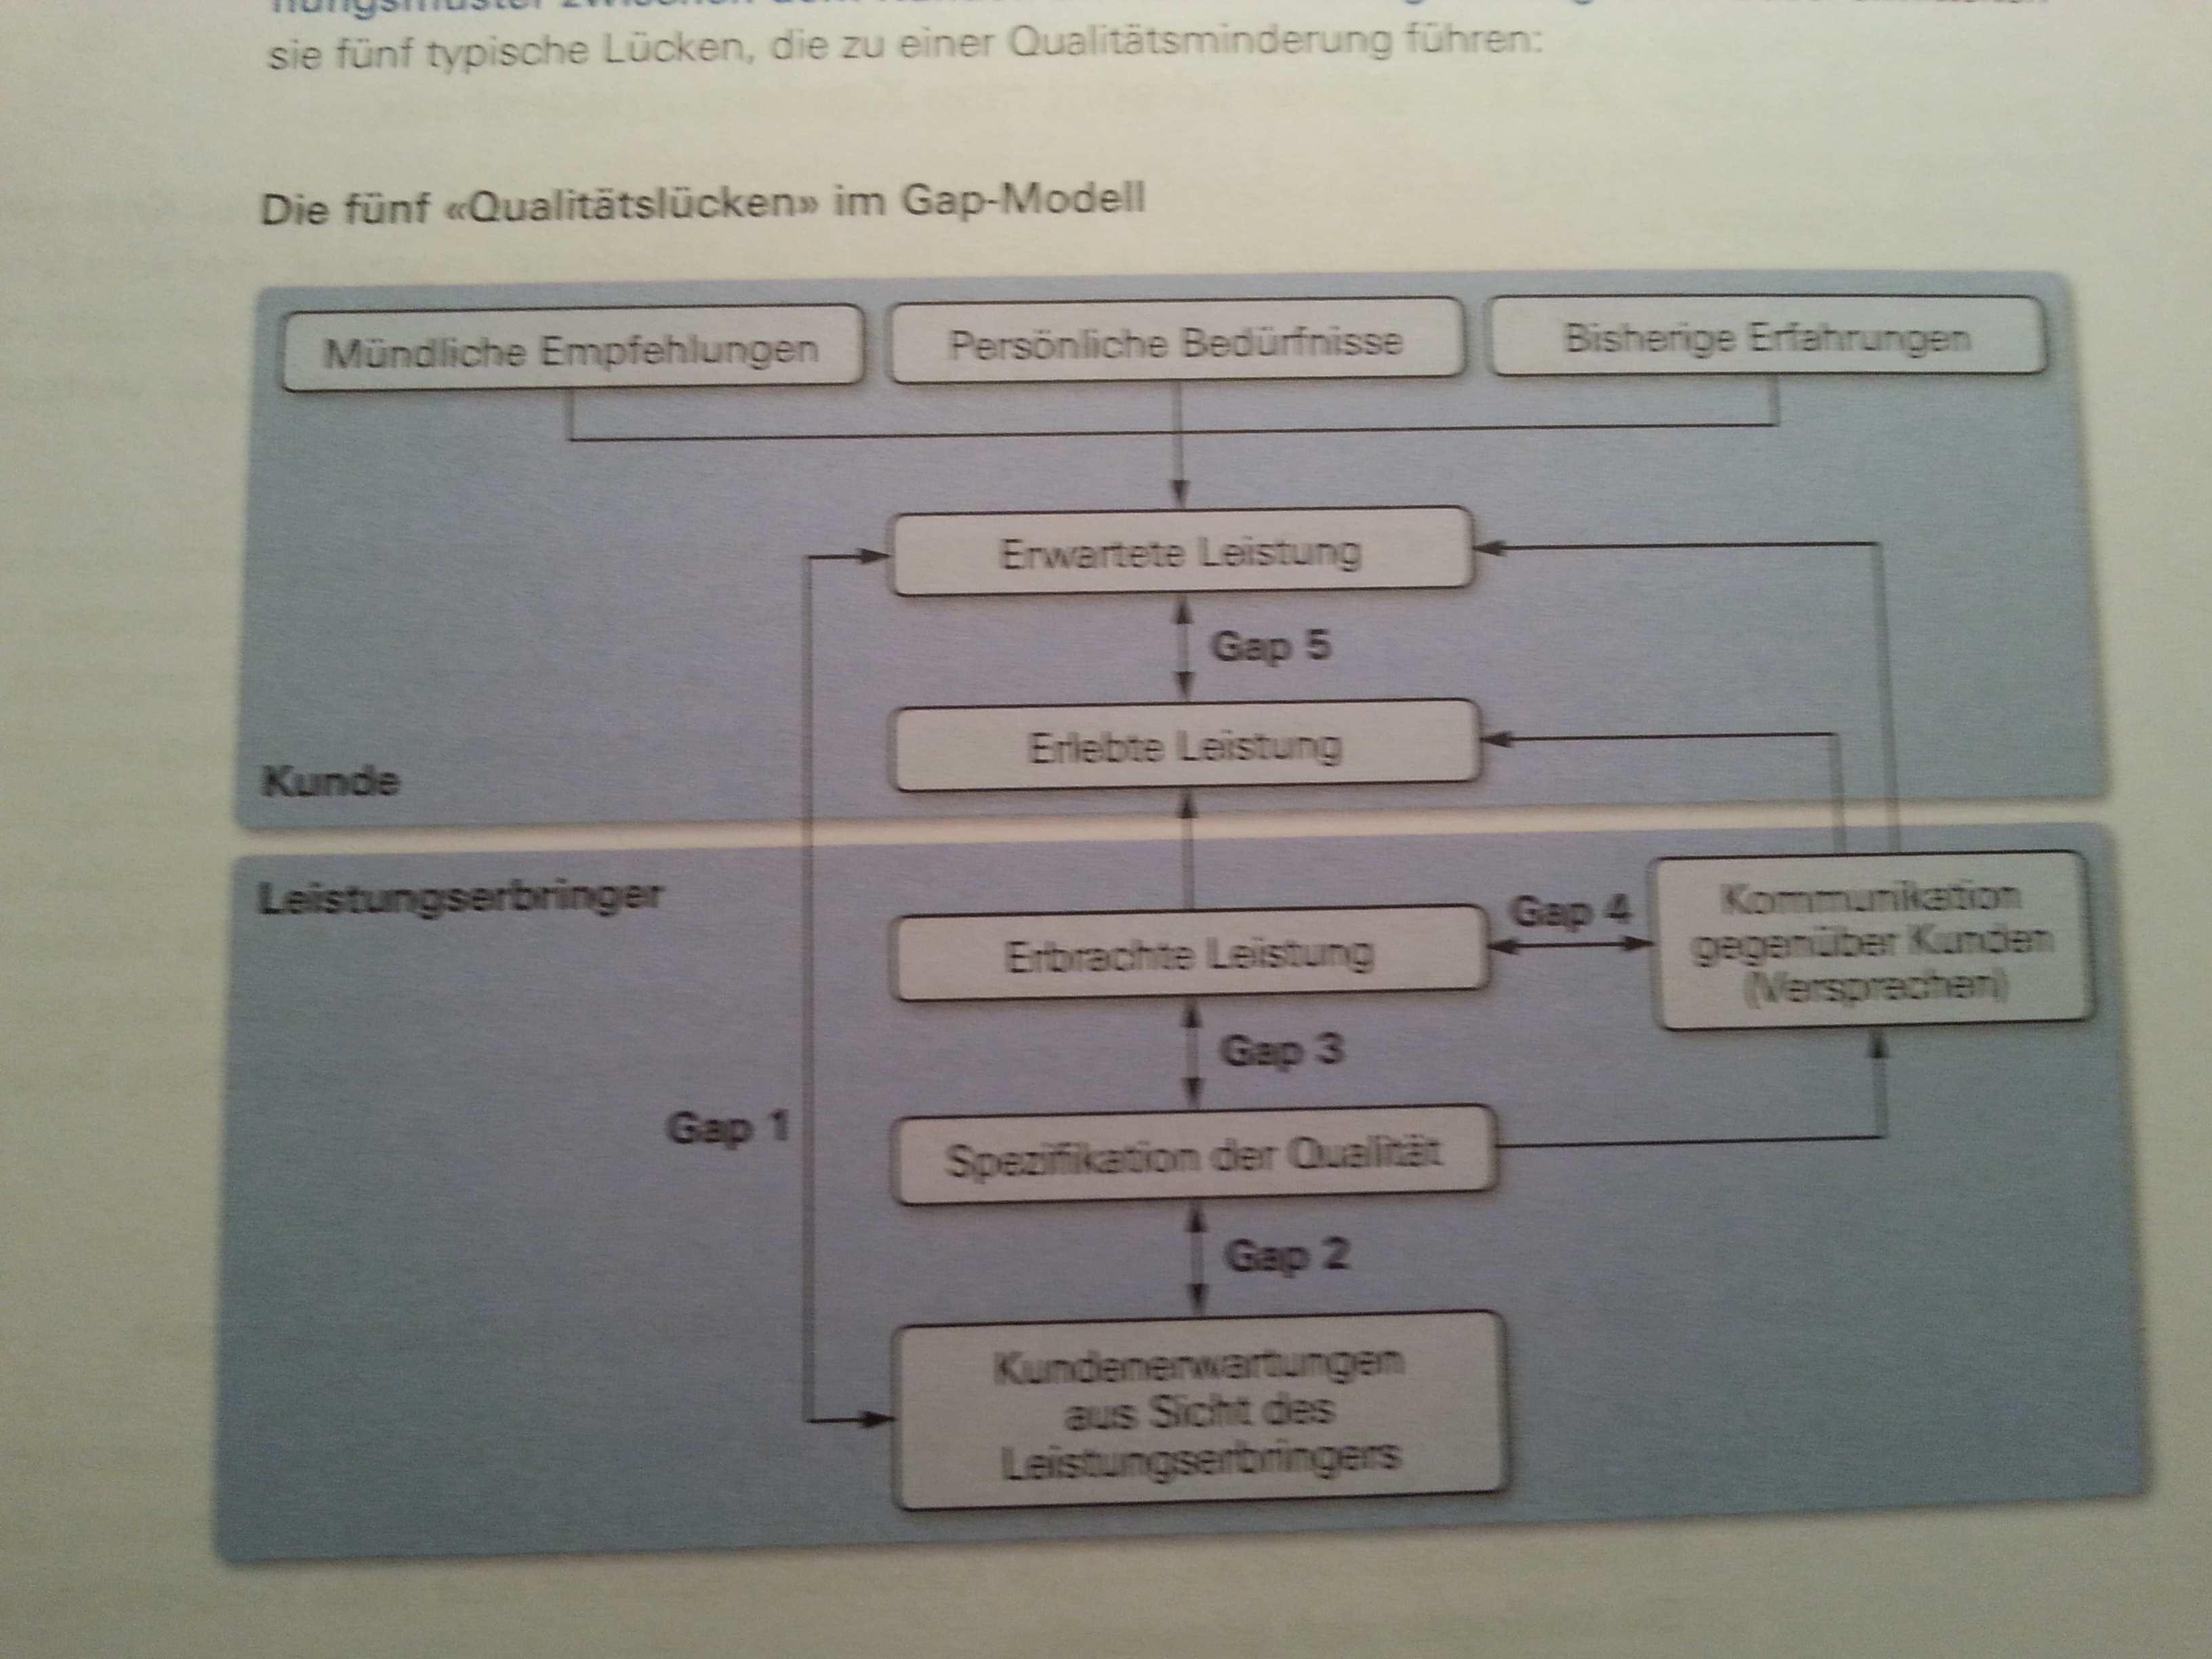 Flashcard Qualitatsmanagement Lms Memocard